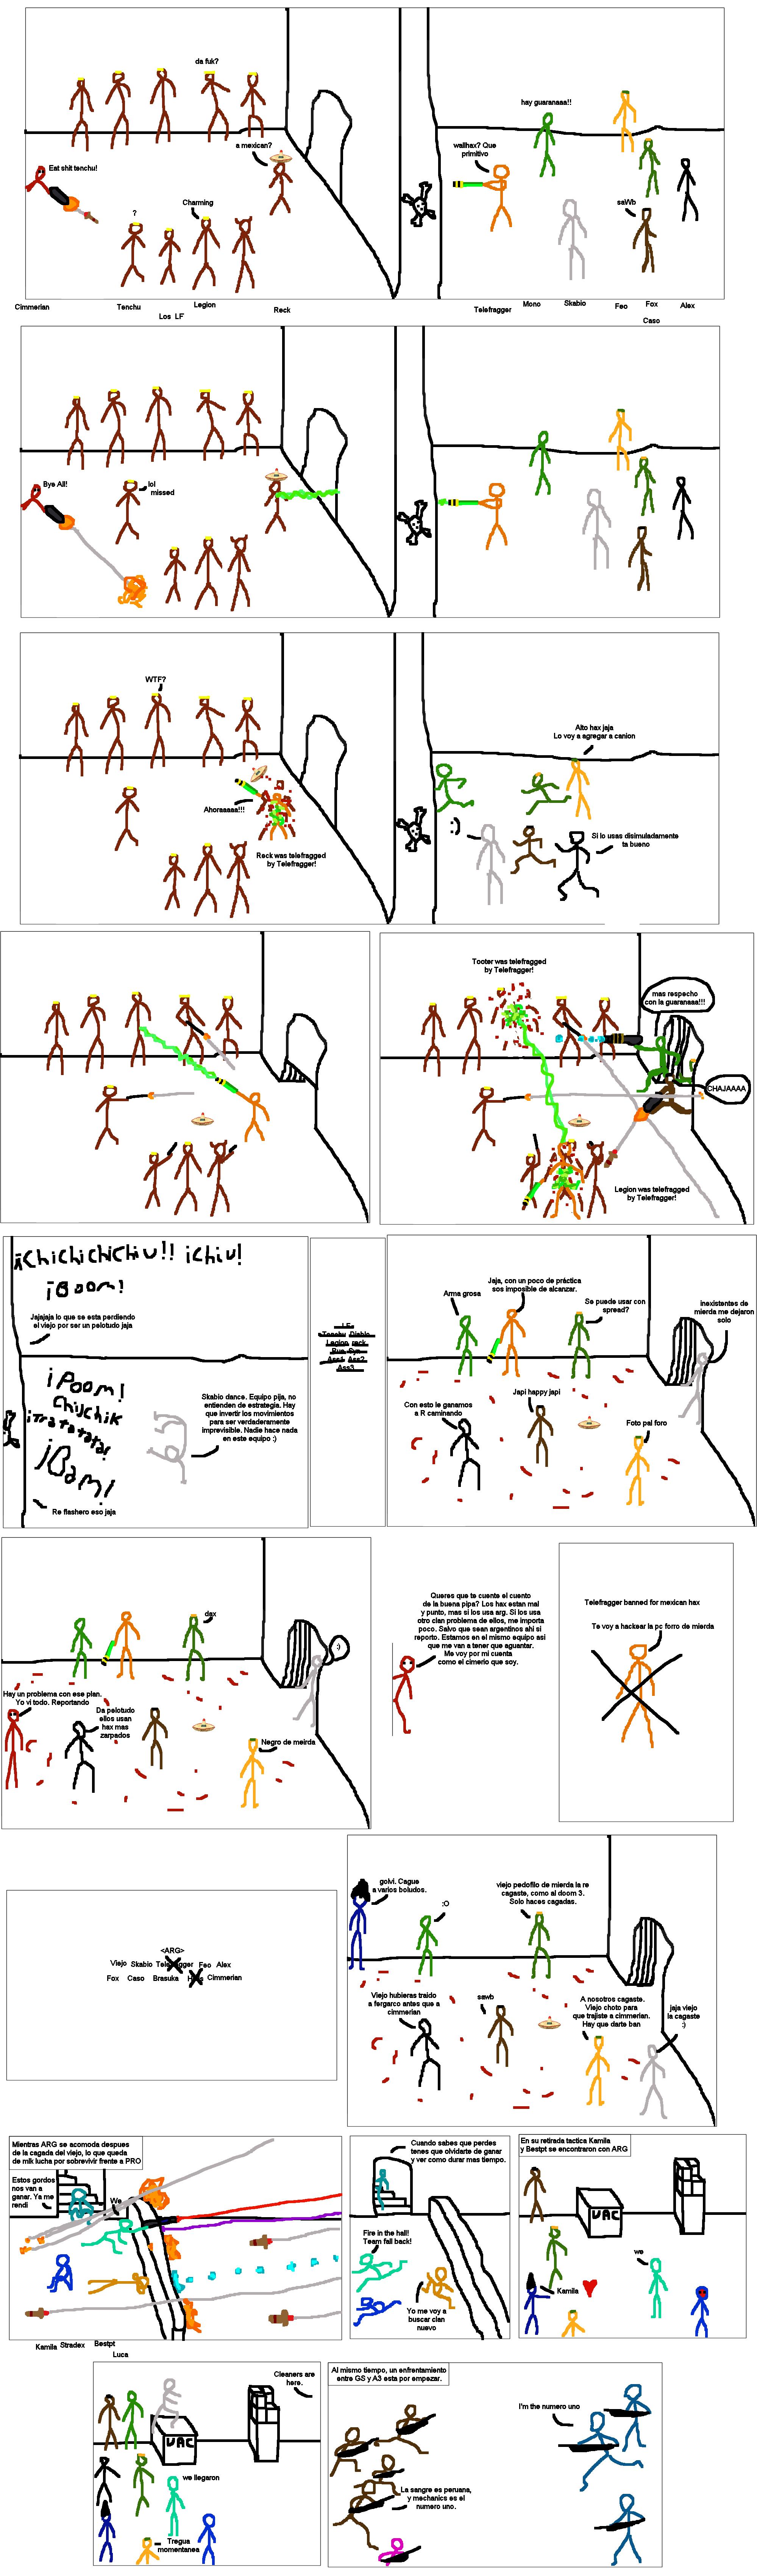 Historieta torneo tlms dragonbolero Pagina_4